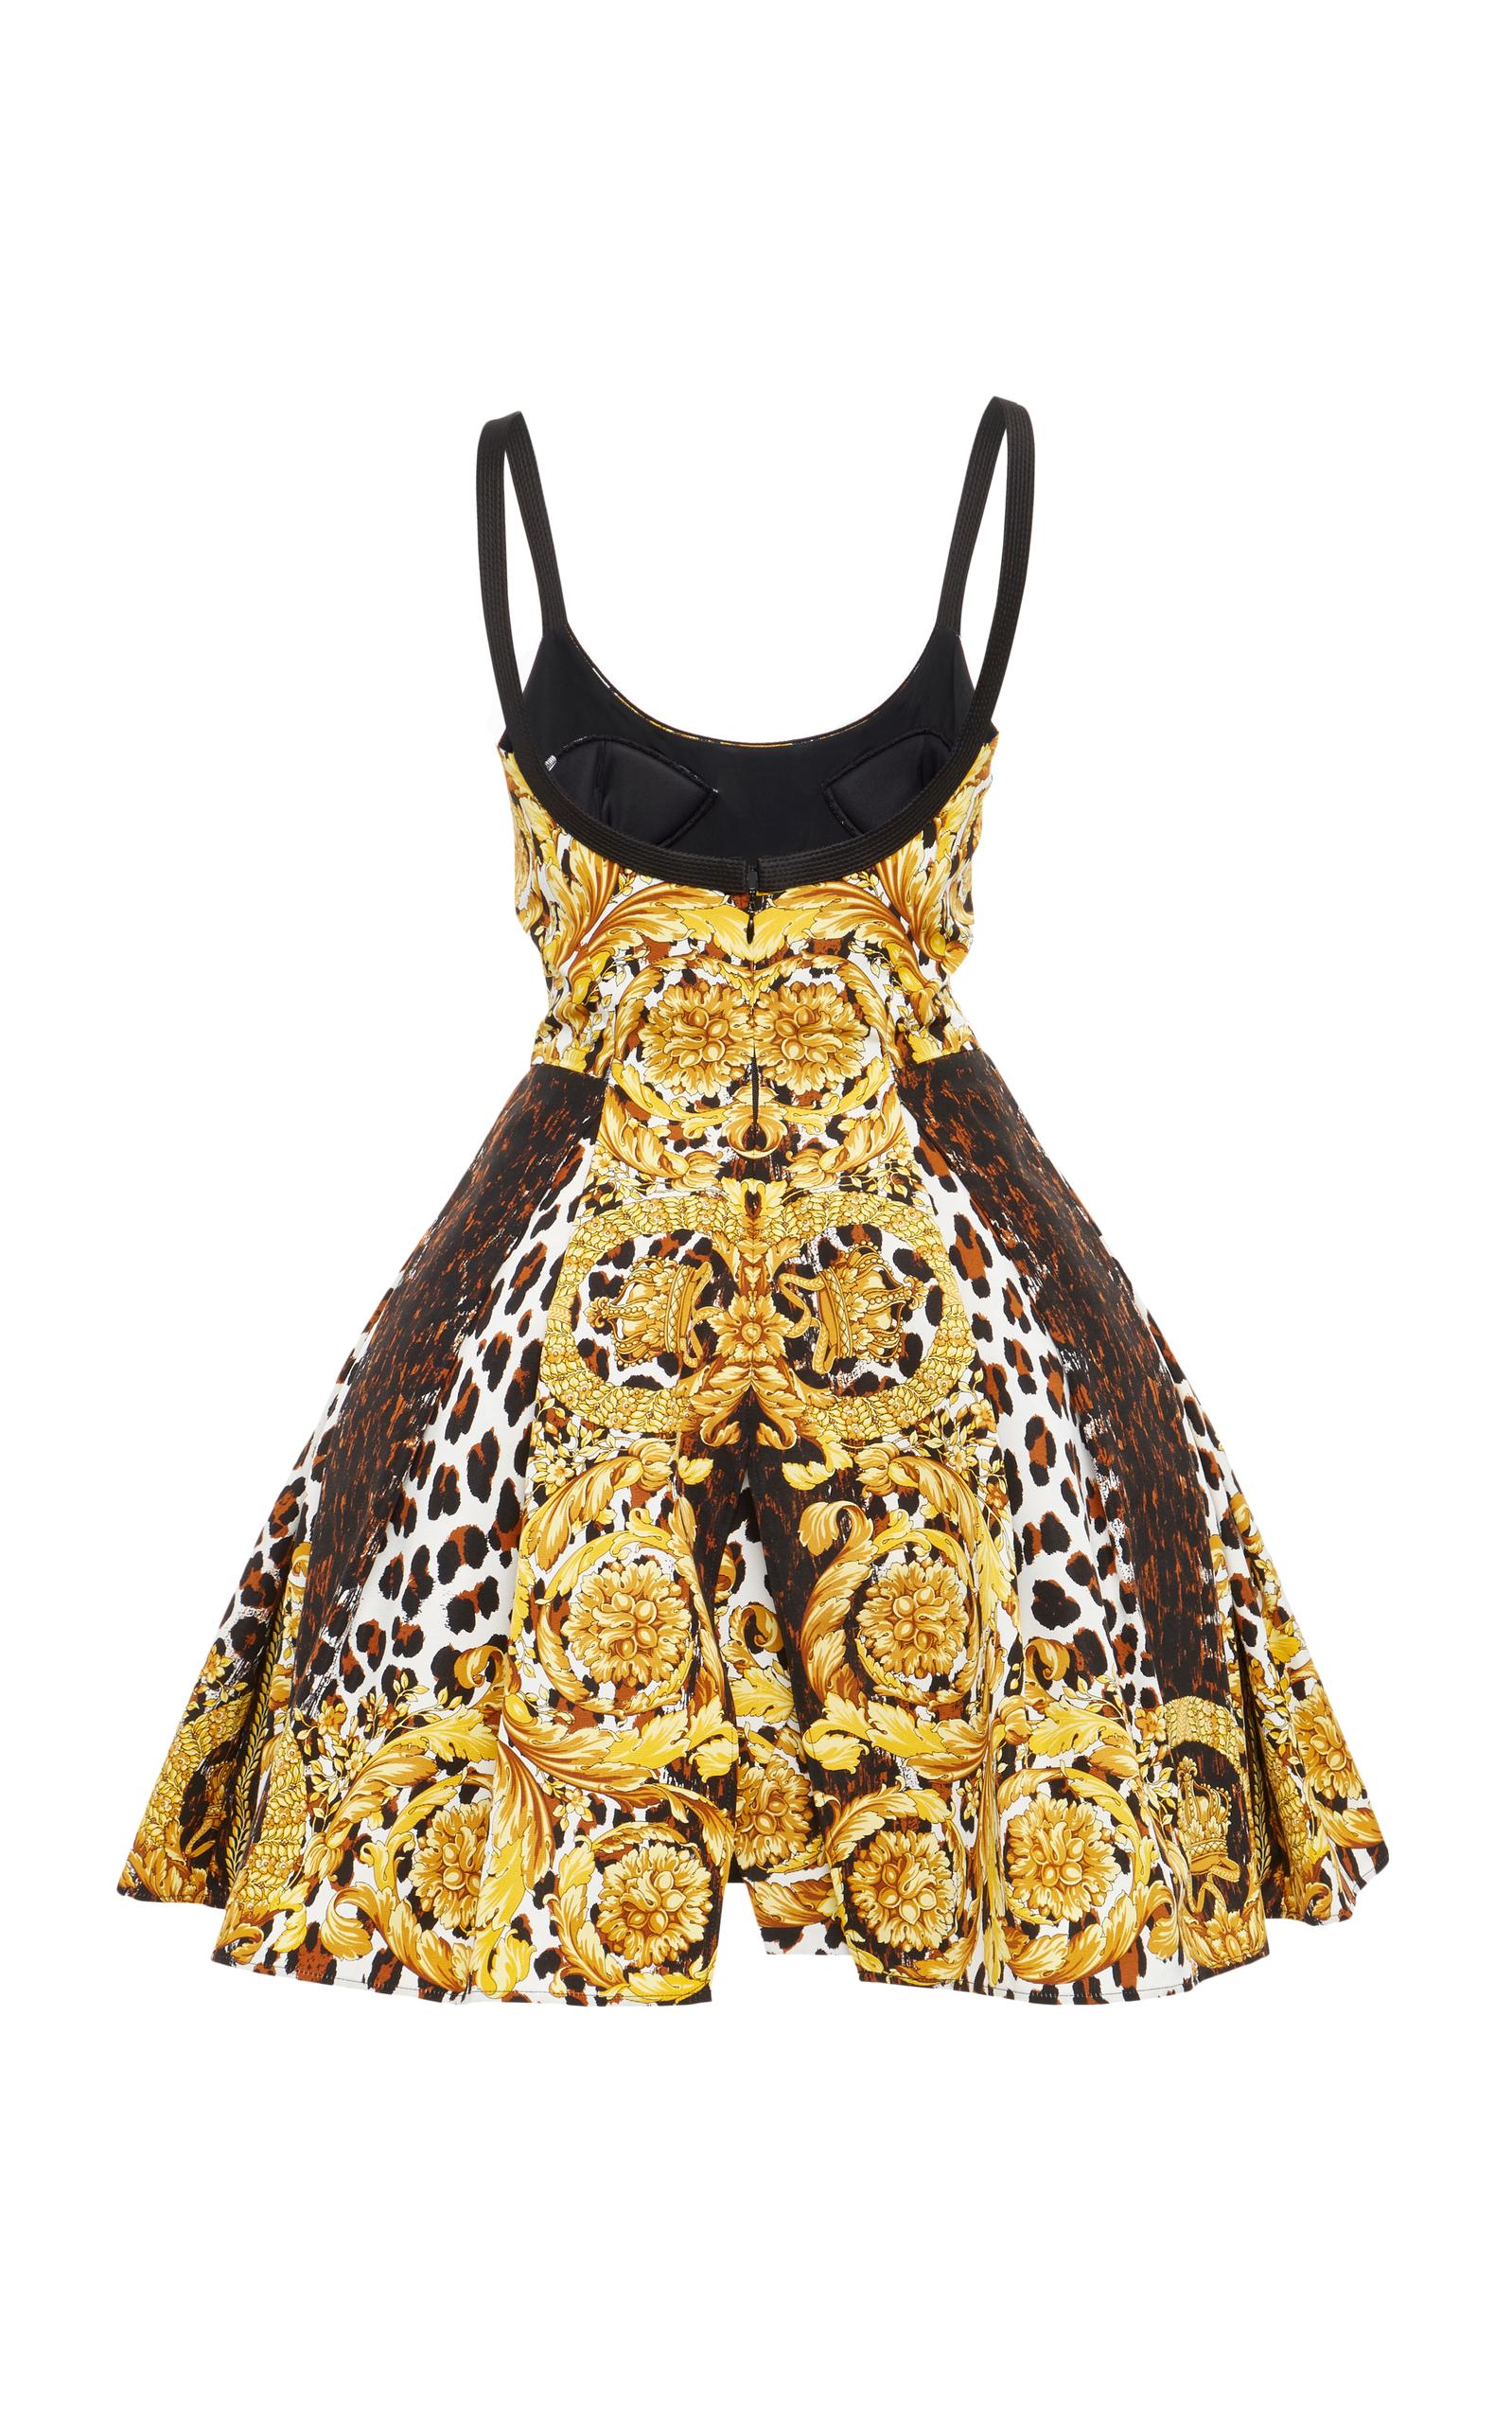 2a4715d5840 Flounced Printed Dress by Versace